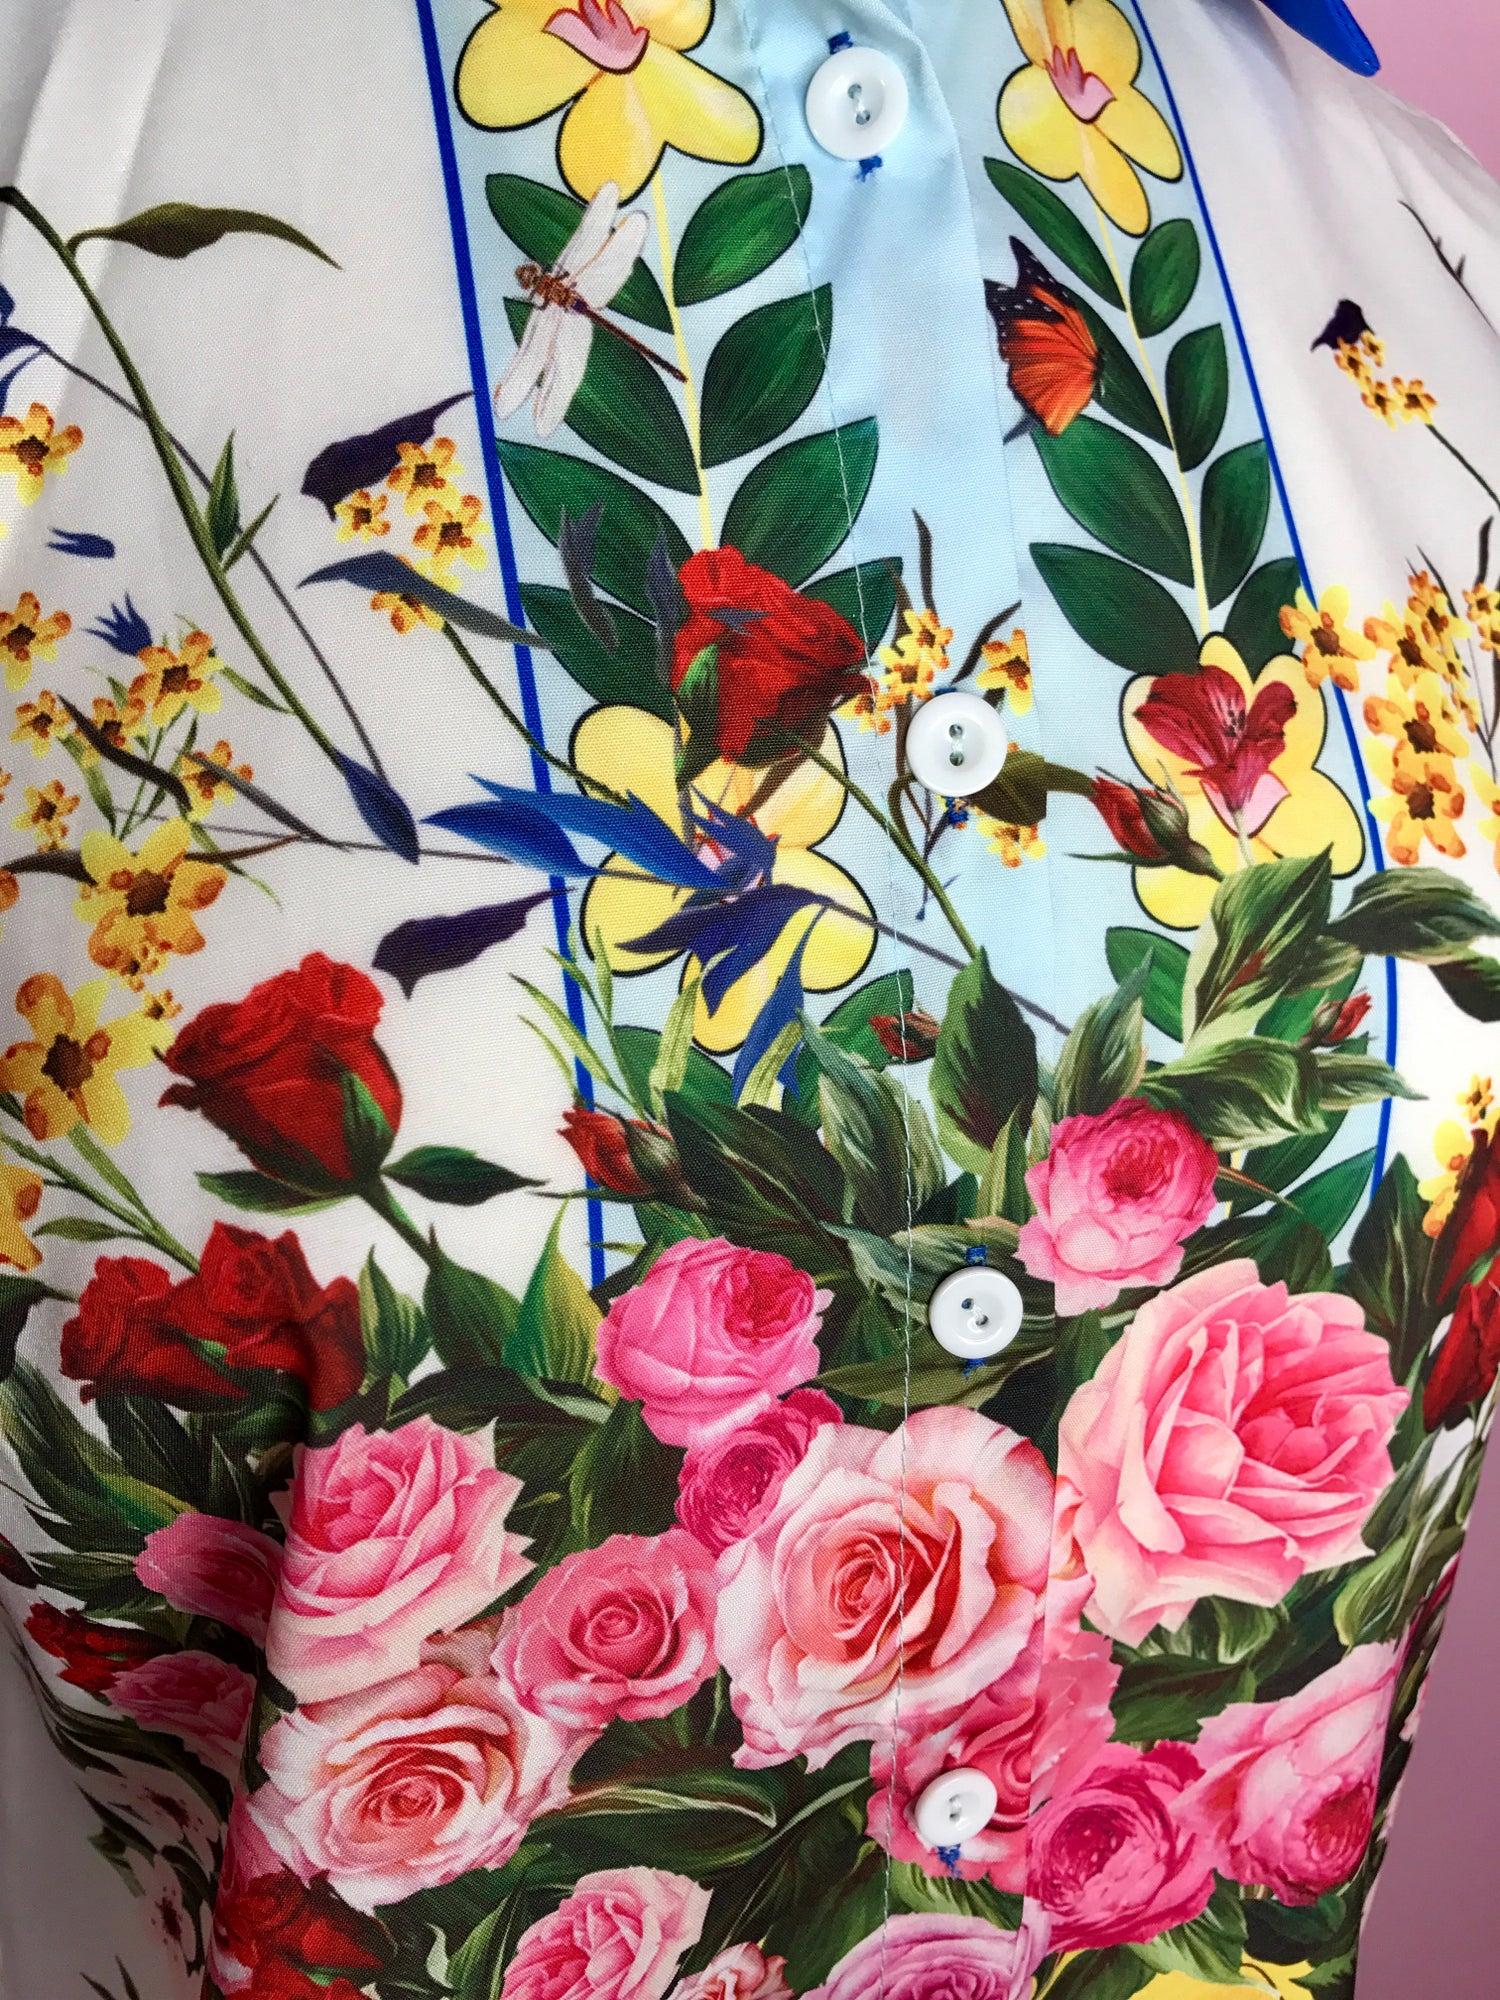 Image of Rose Garden